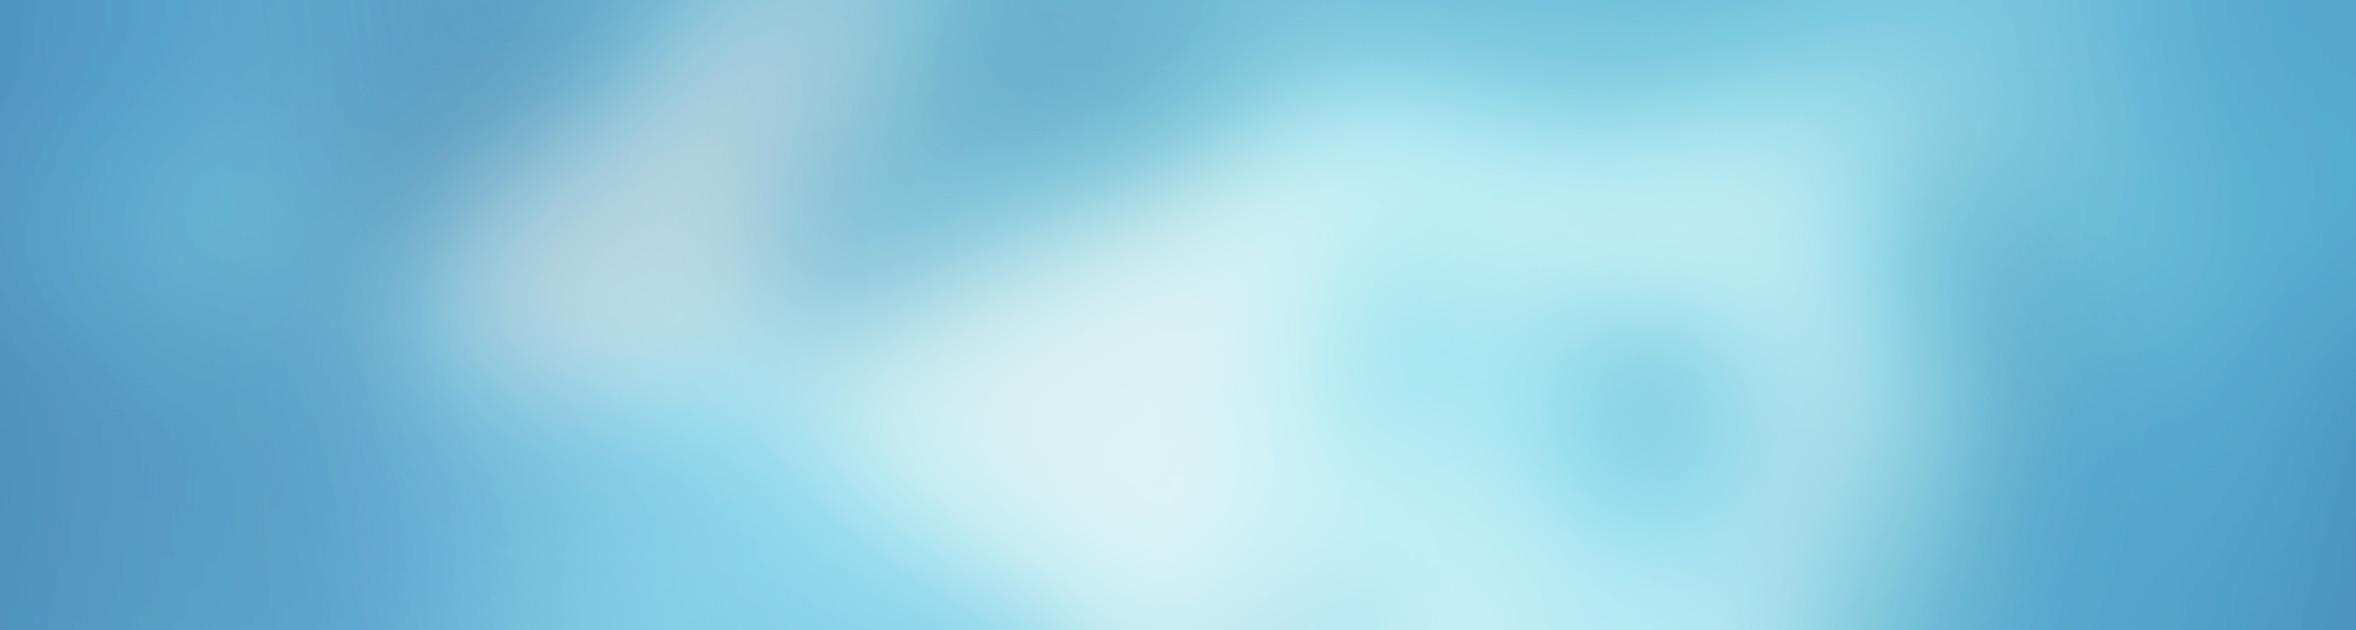 blue-tone